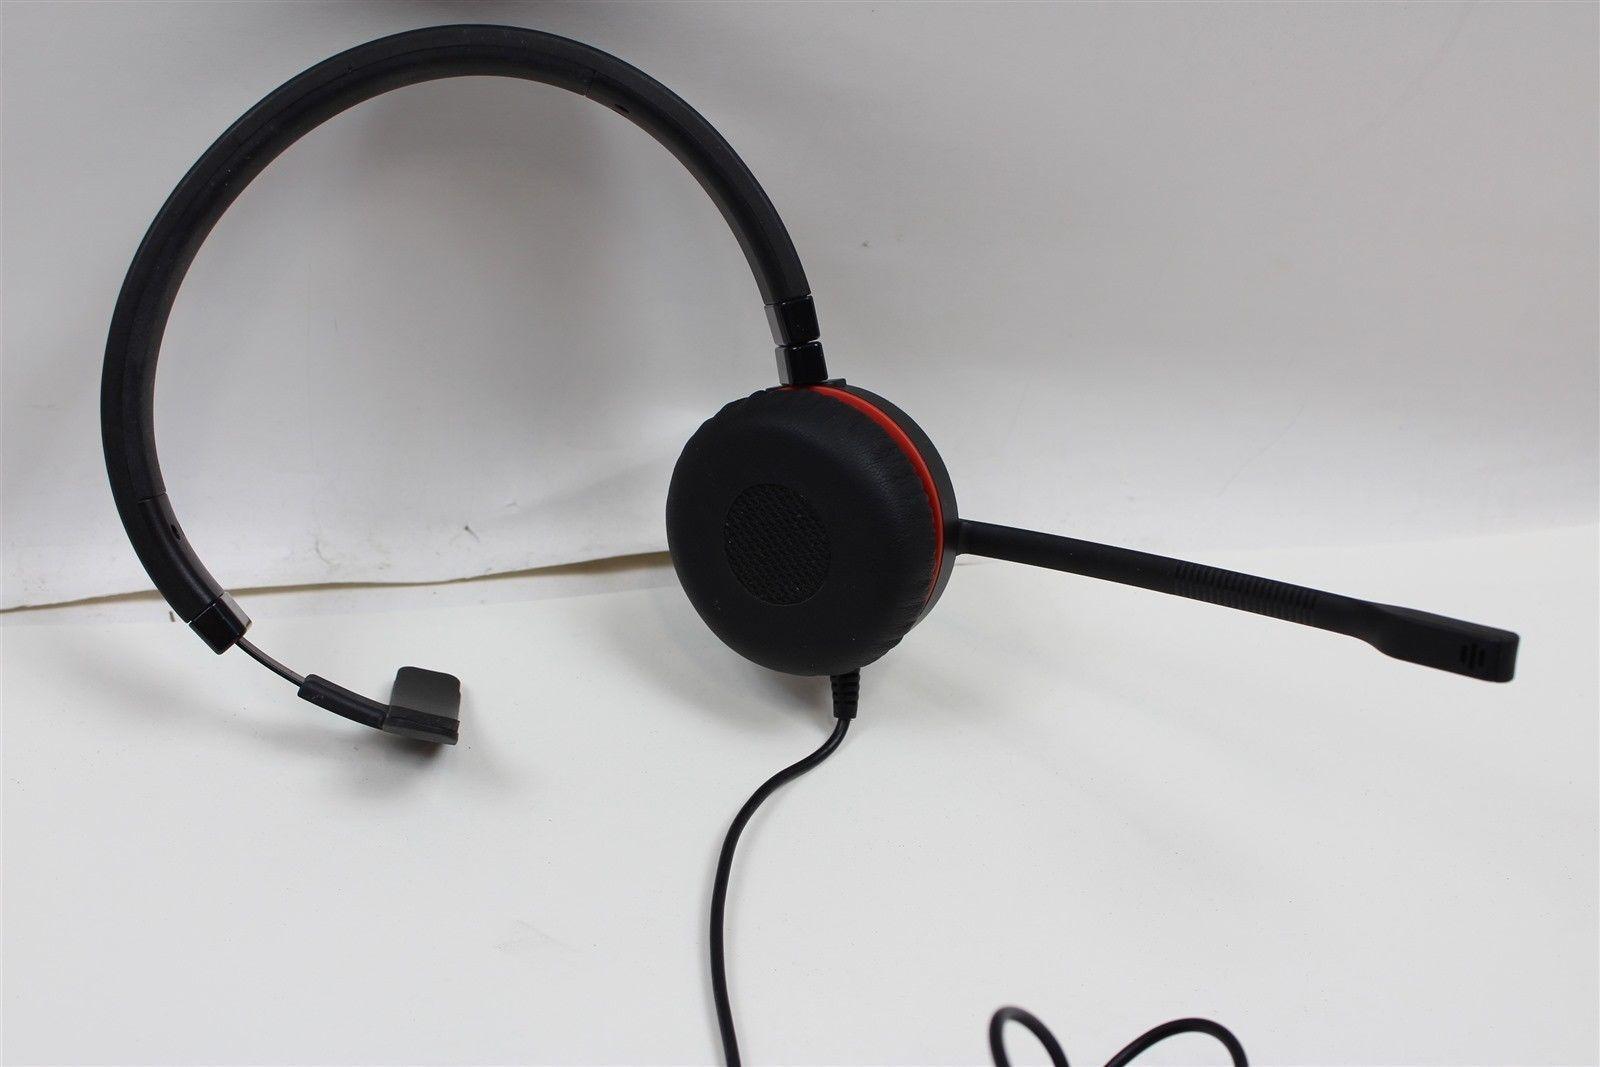 Jabra Evolve 20 HSC016 UC Voice 750 MS USB Headset for sale online